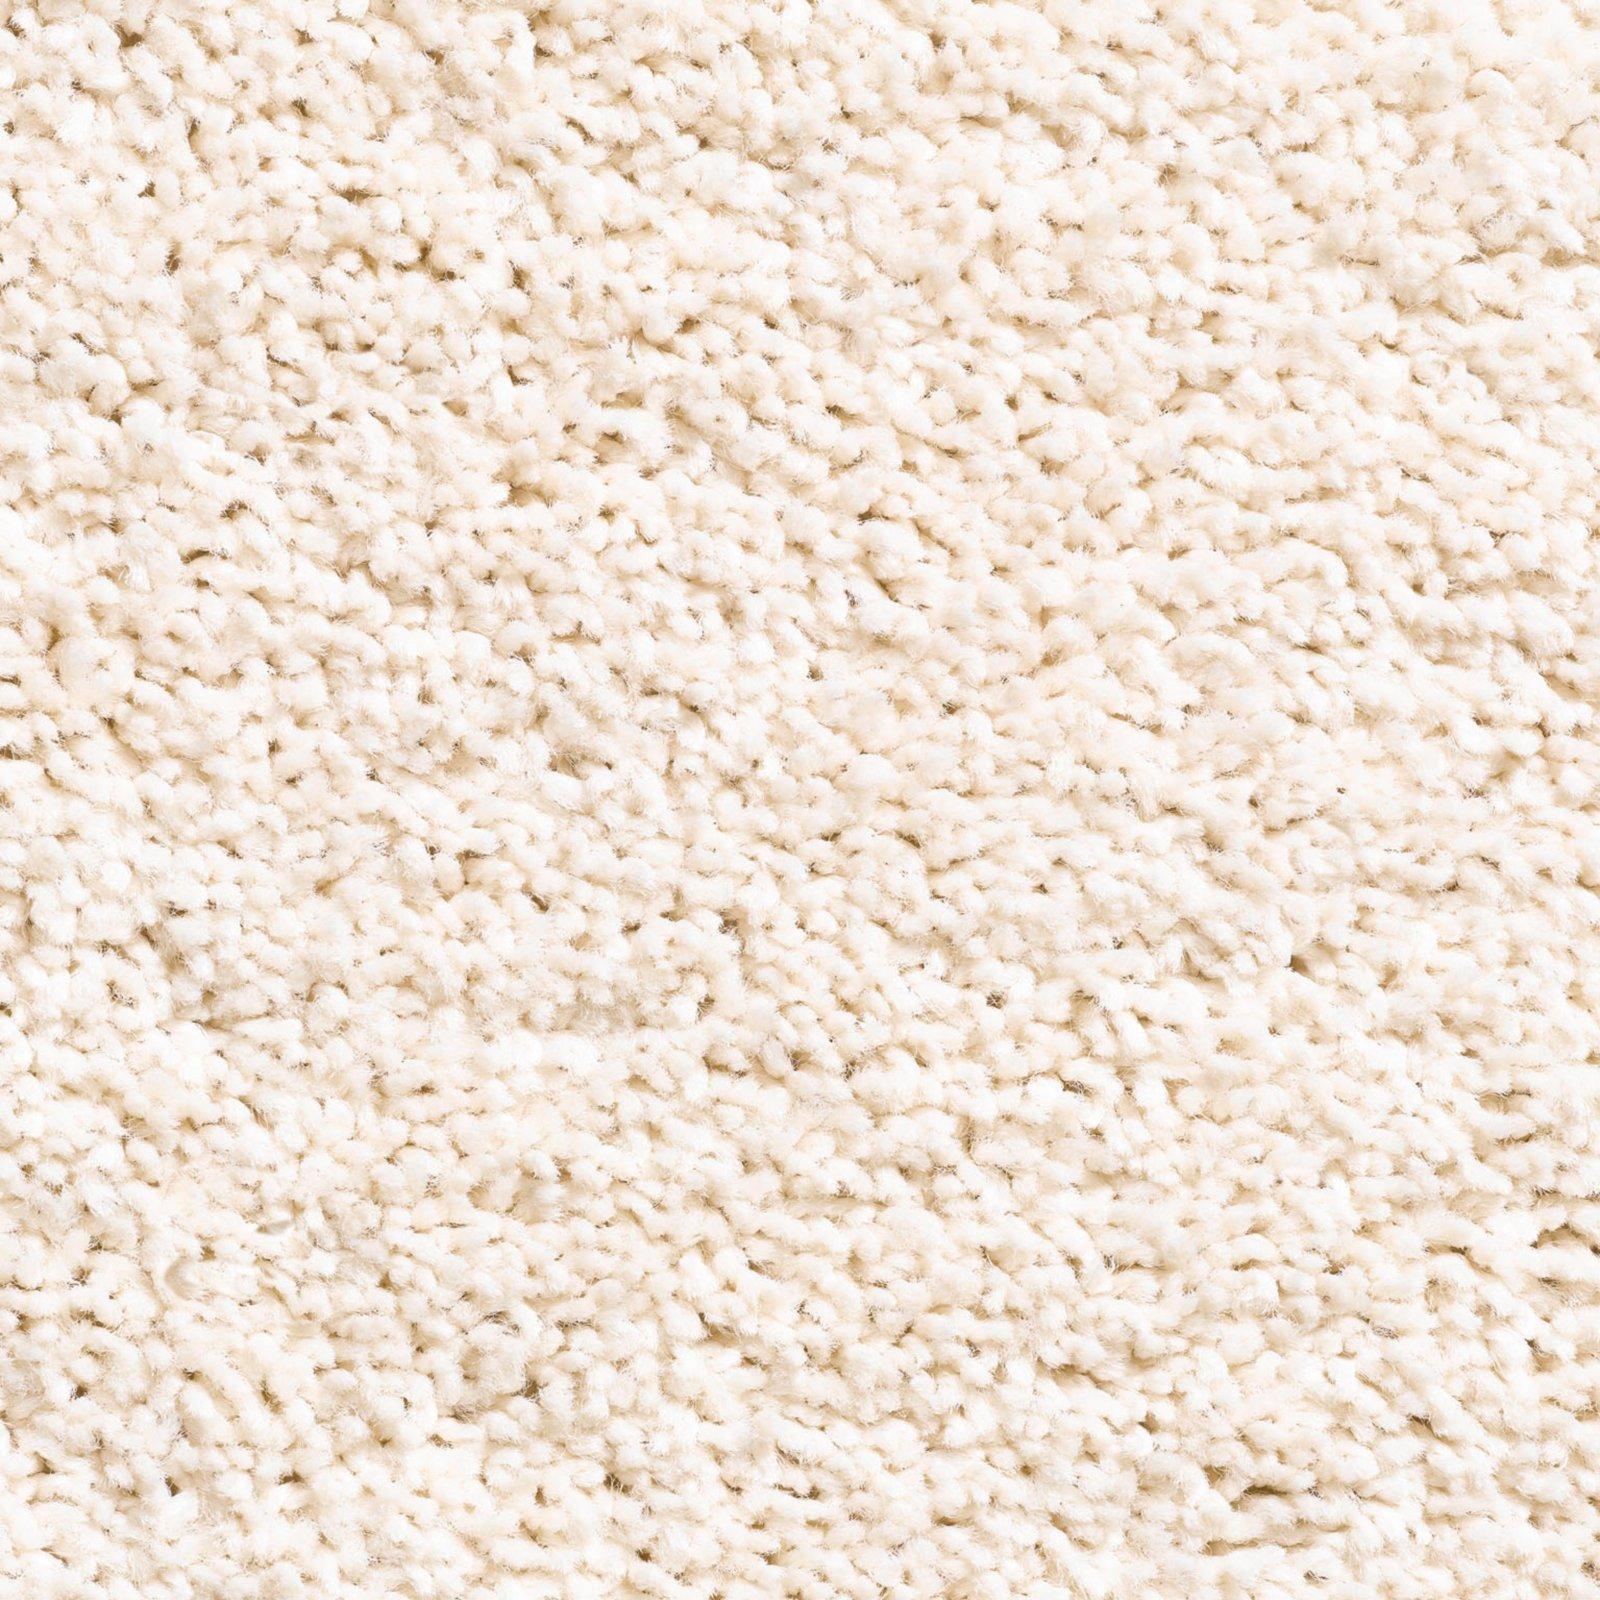 teppichboden bellini wei 4 meter breit teppichboden bodenbel ge baumarkt roller. Black Bedroom Furniture Sets. Home Design Ideas